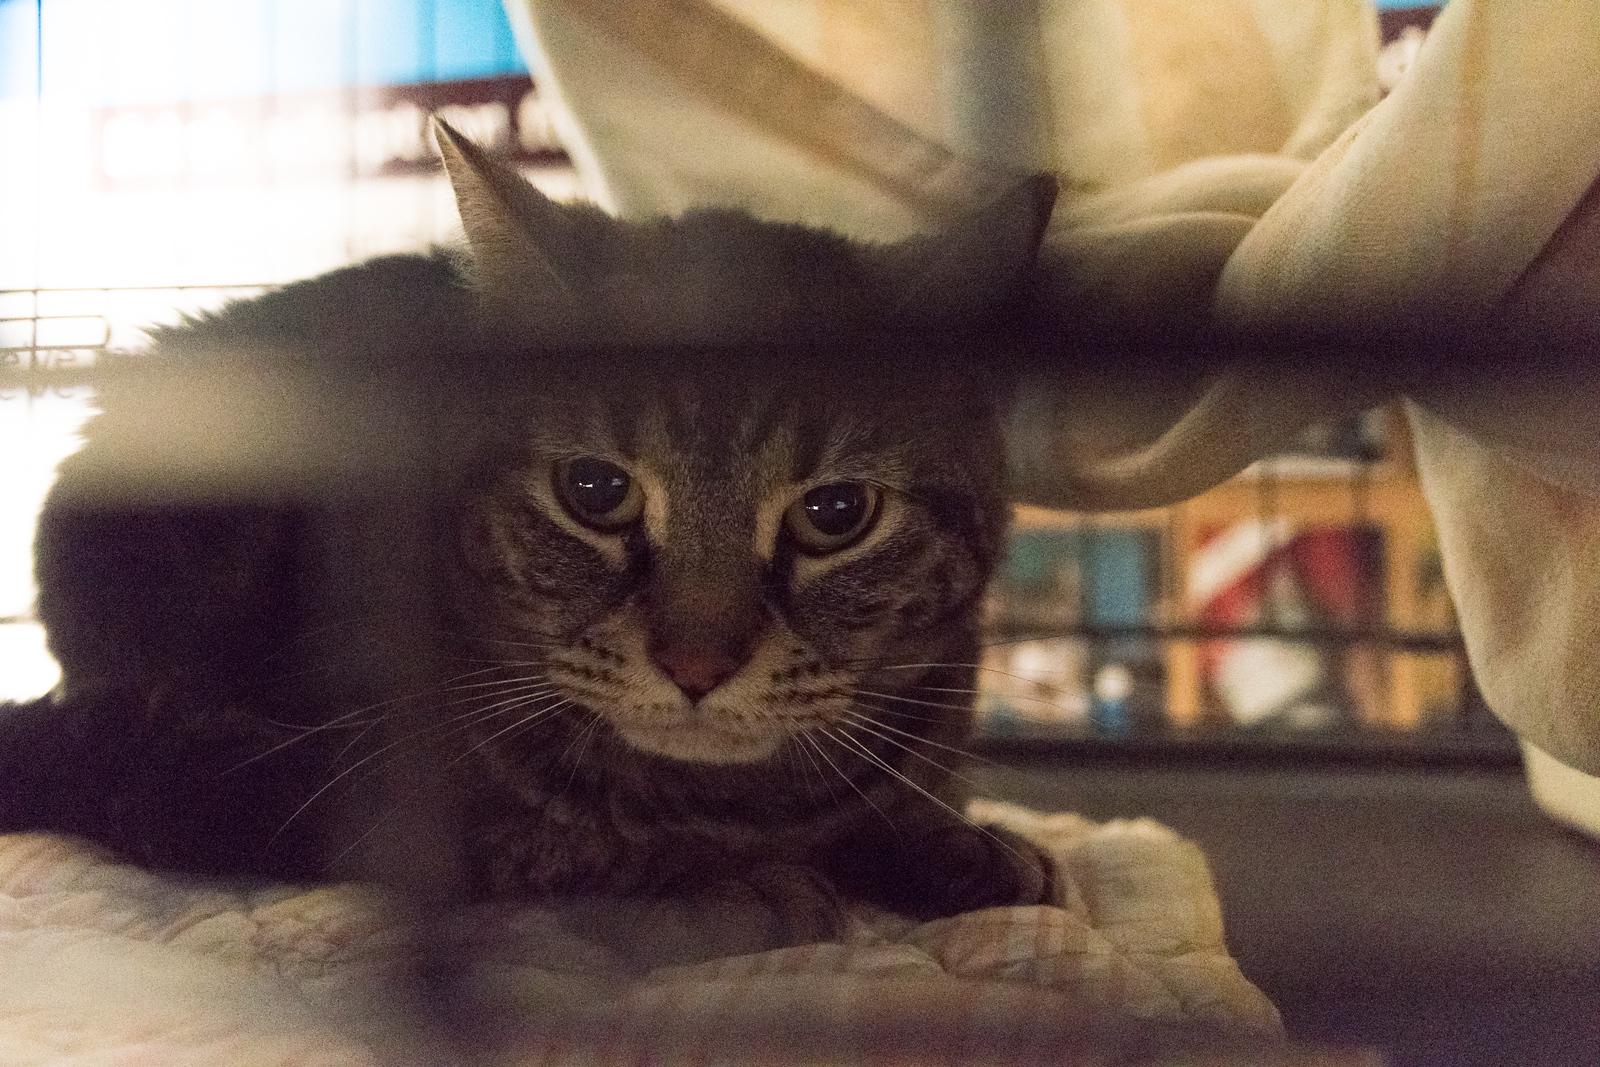 Luna in her cave, so unhappy